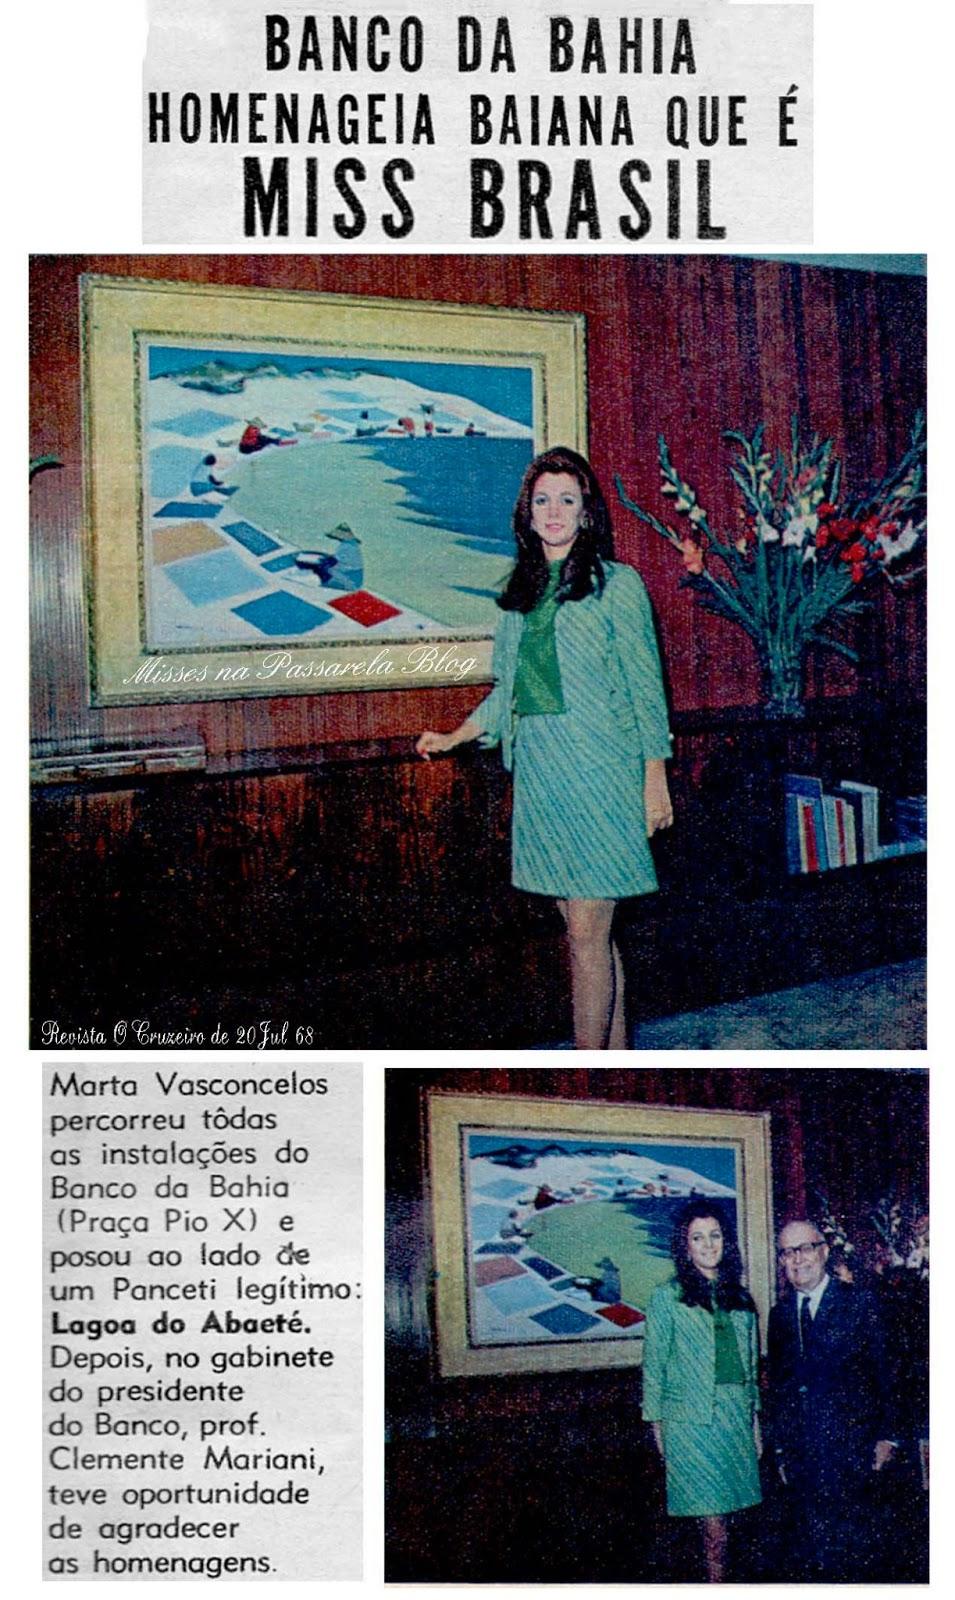 ☽ ✮ ✯ ✰ ☆ ☁ Galeria de Martha Vasconcelos, Miss Universe 1968.☽ ✮ ✯ ✰ ☆ ☁ Martha+Vasconcellos+na+Bahia